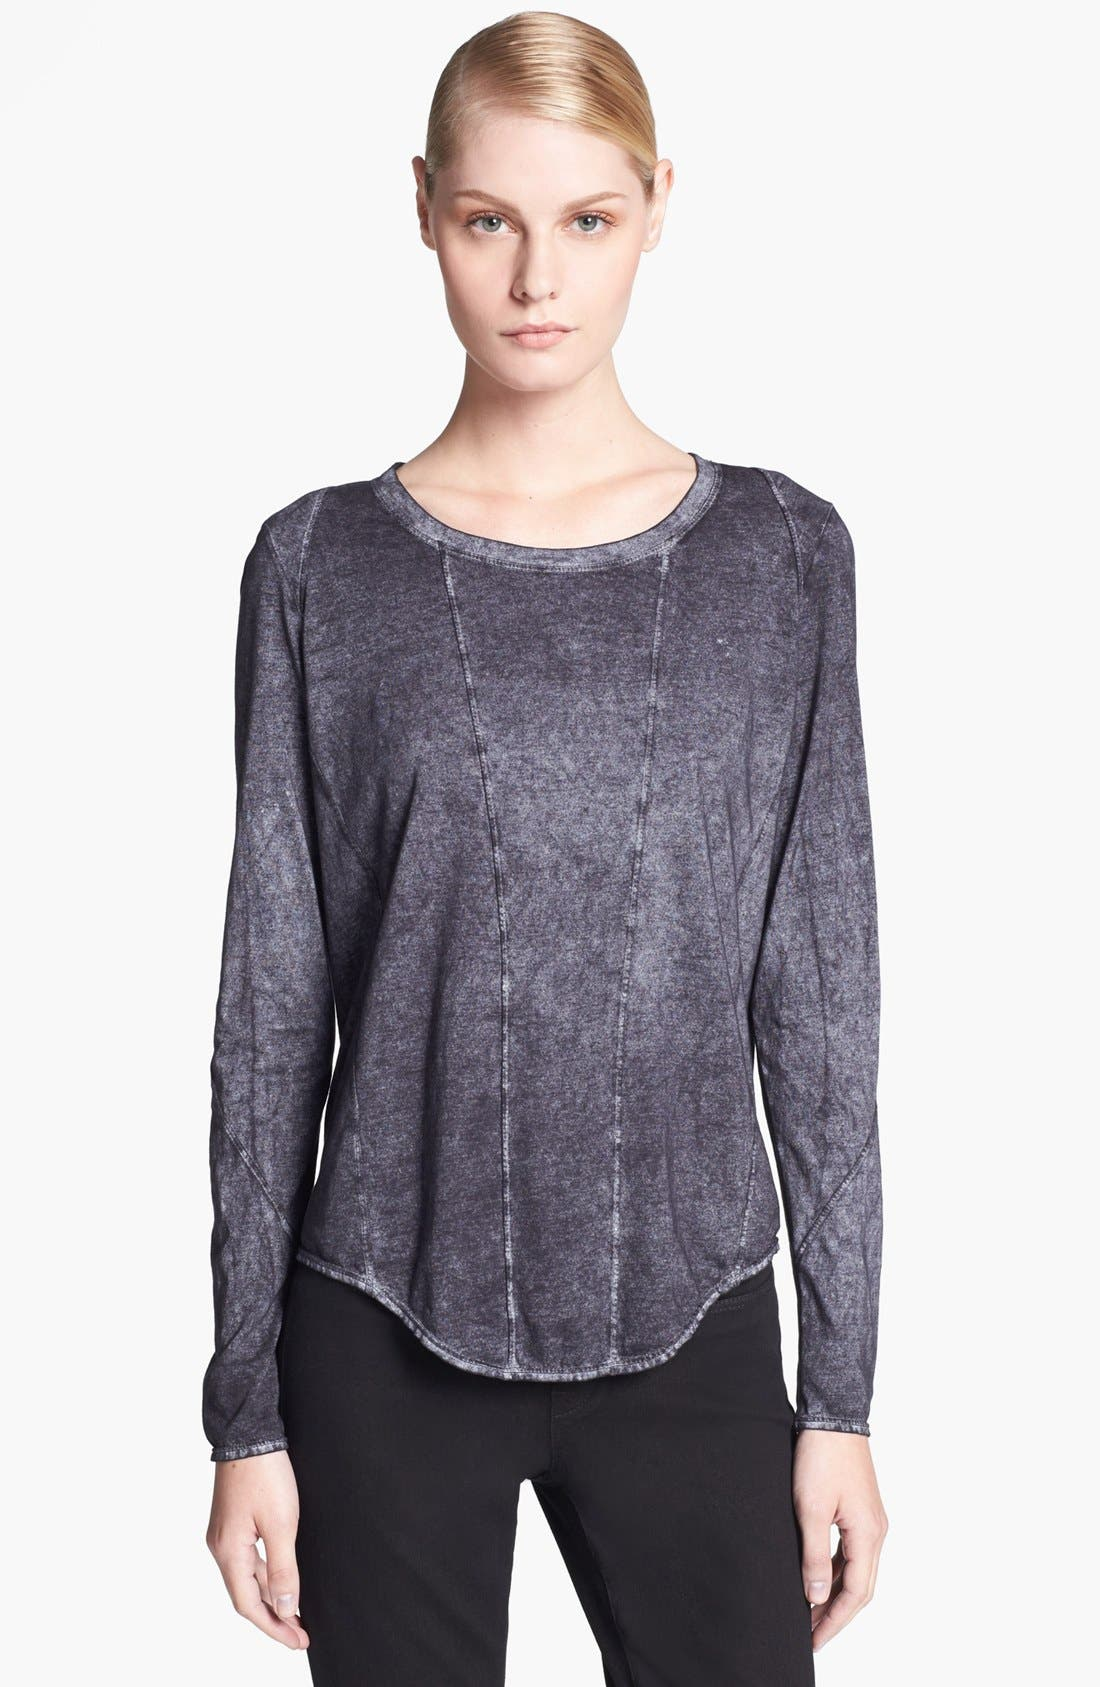 Alternate Image 1 Selected - HELMUT Helmut Lang 'Chalk' Long Sleeve Jersey Tee